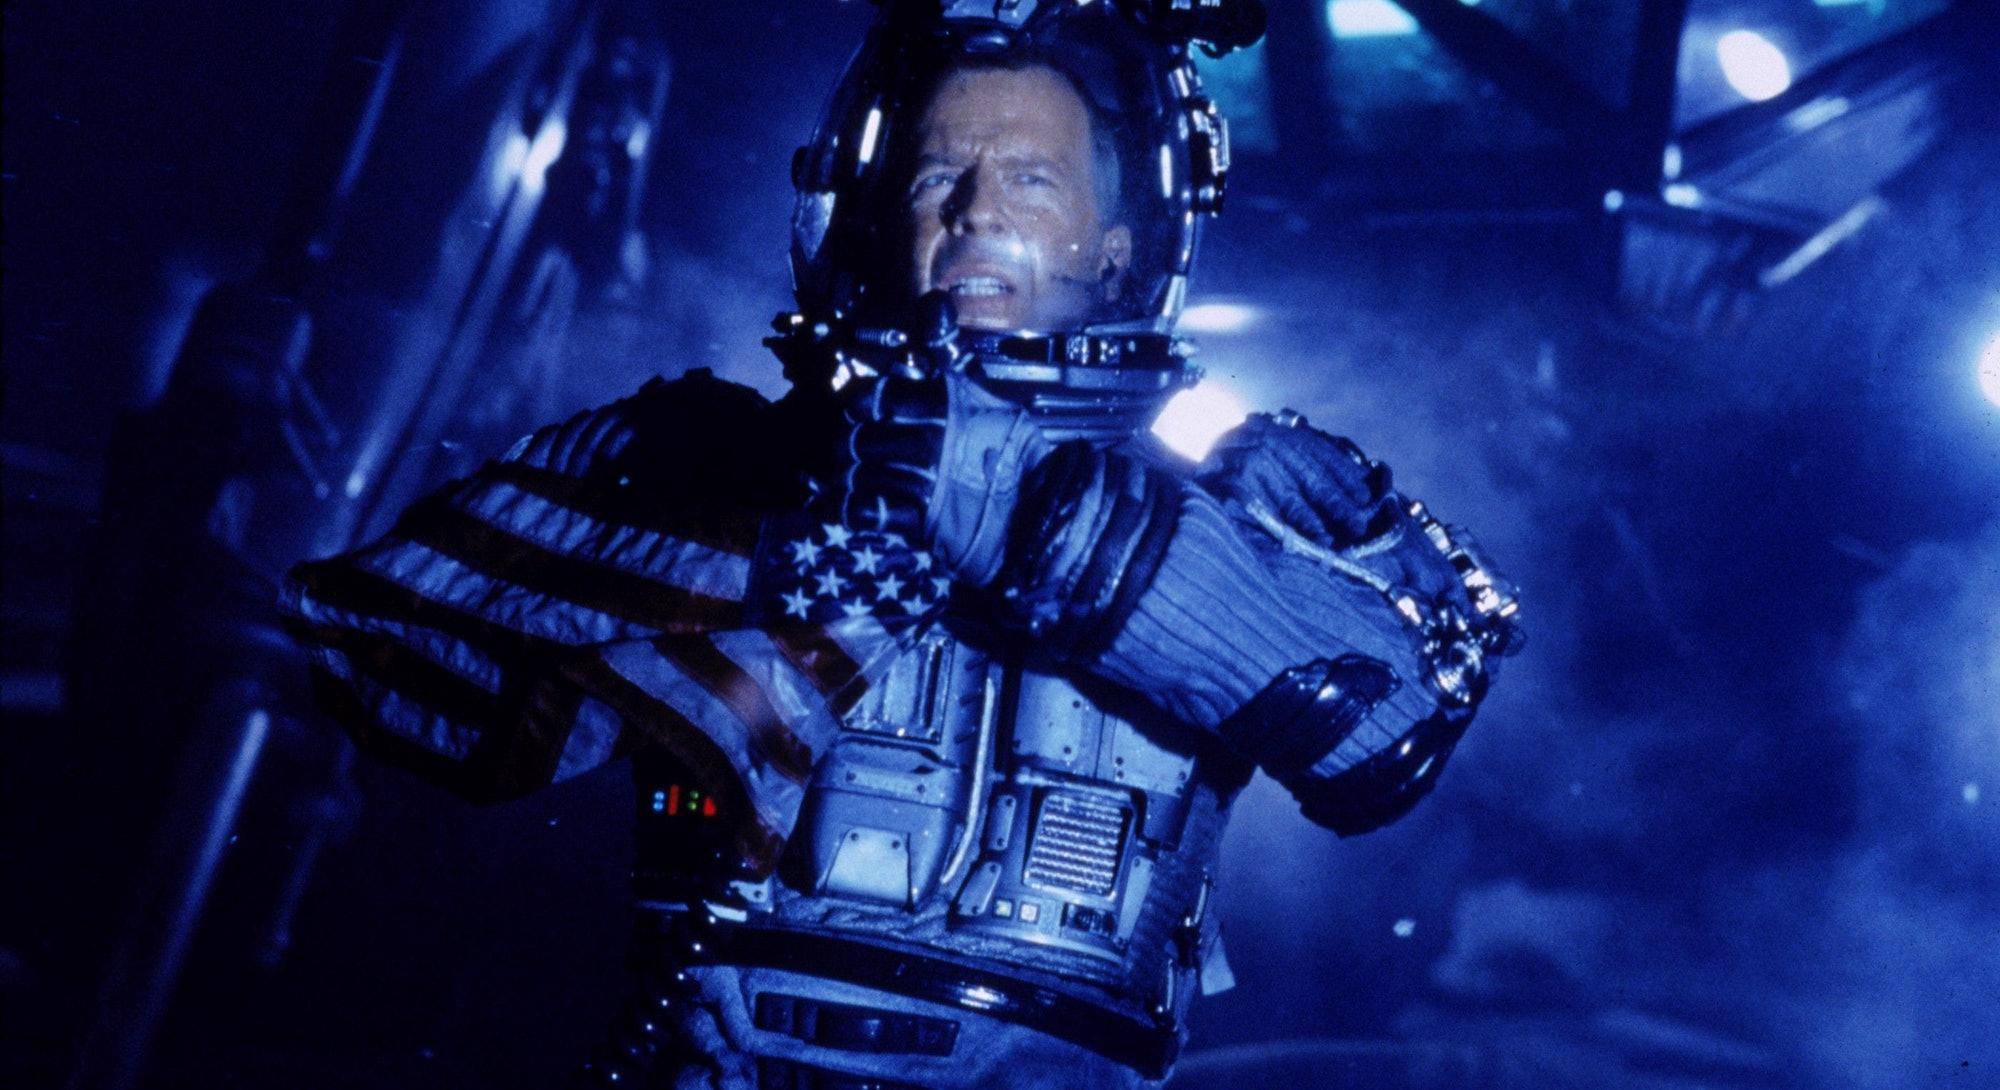 screenshot of Bruce Willis in spacesuit from Armageddon